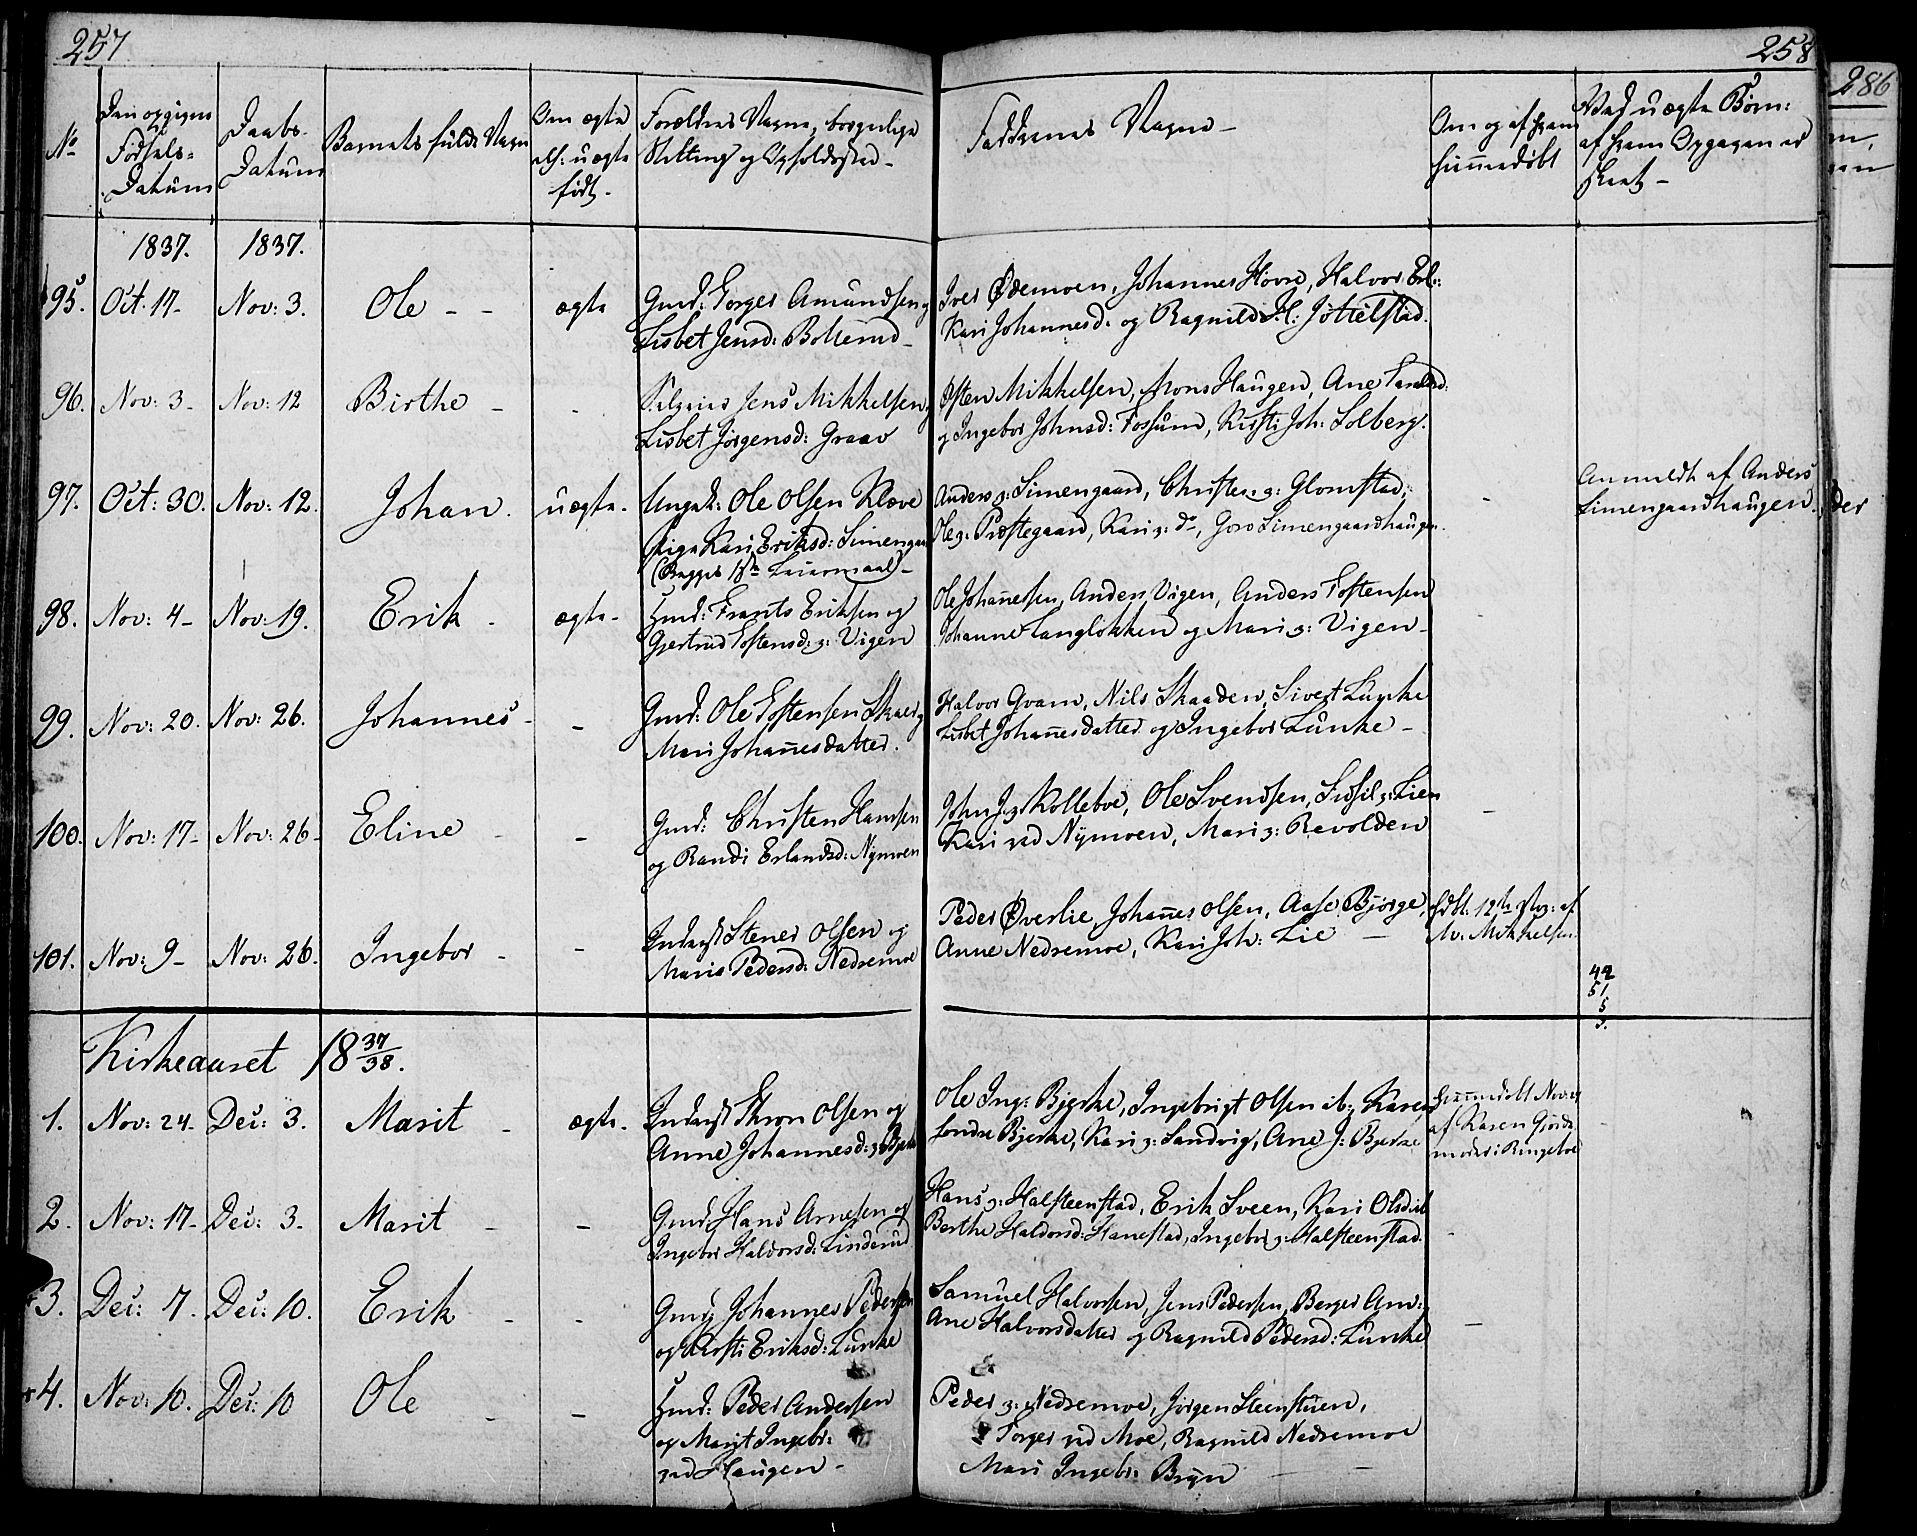 SAH, Øyer prestekontor, Ministerialbok nr. 4, 1824-1841, s. 257-258